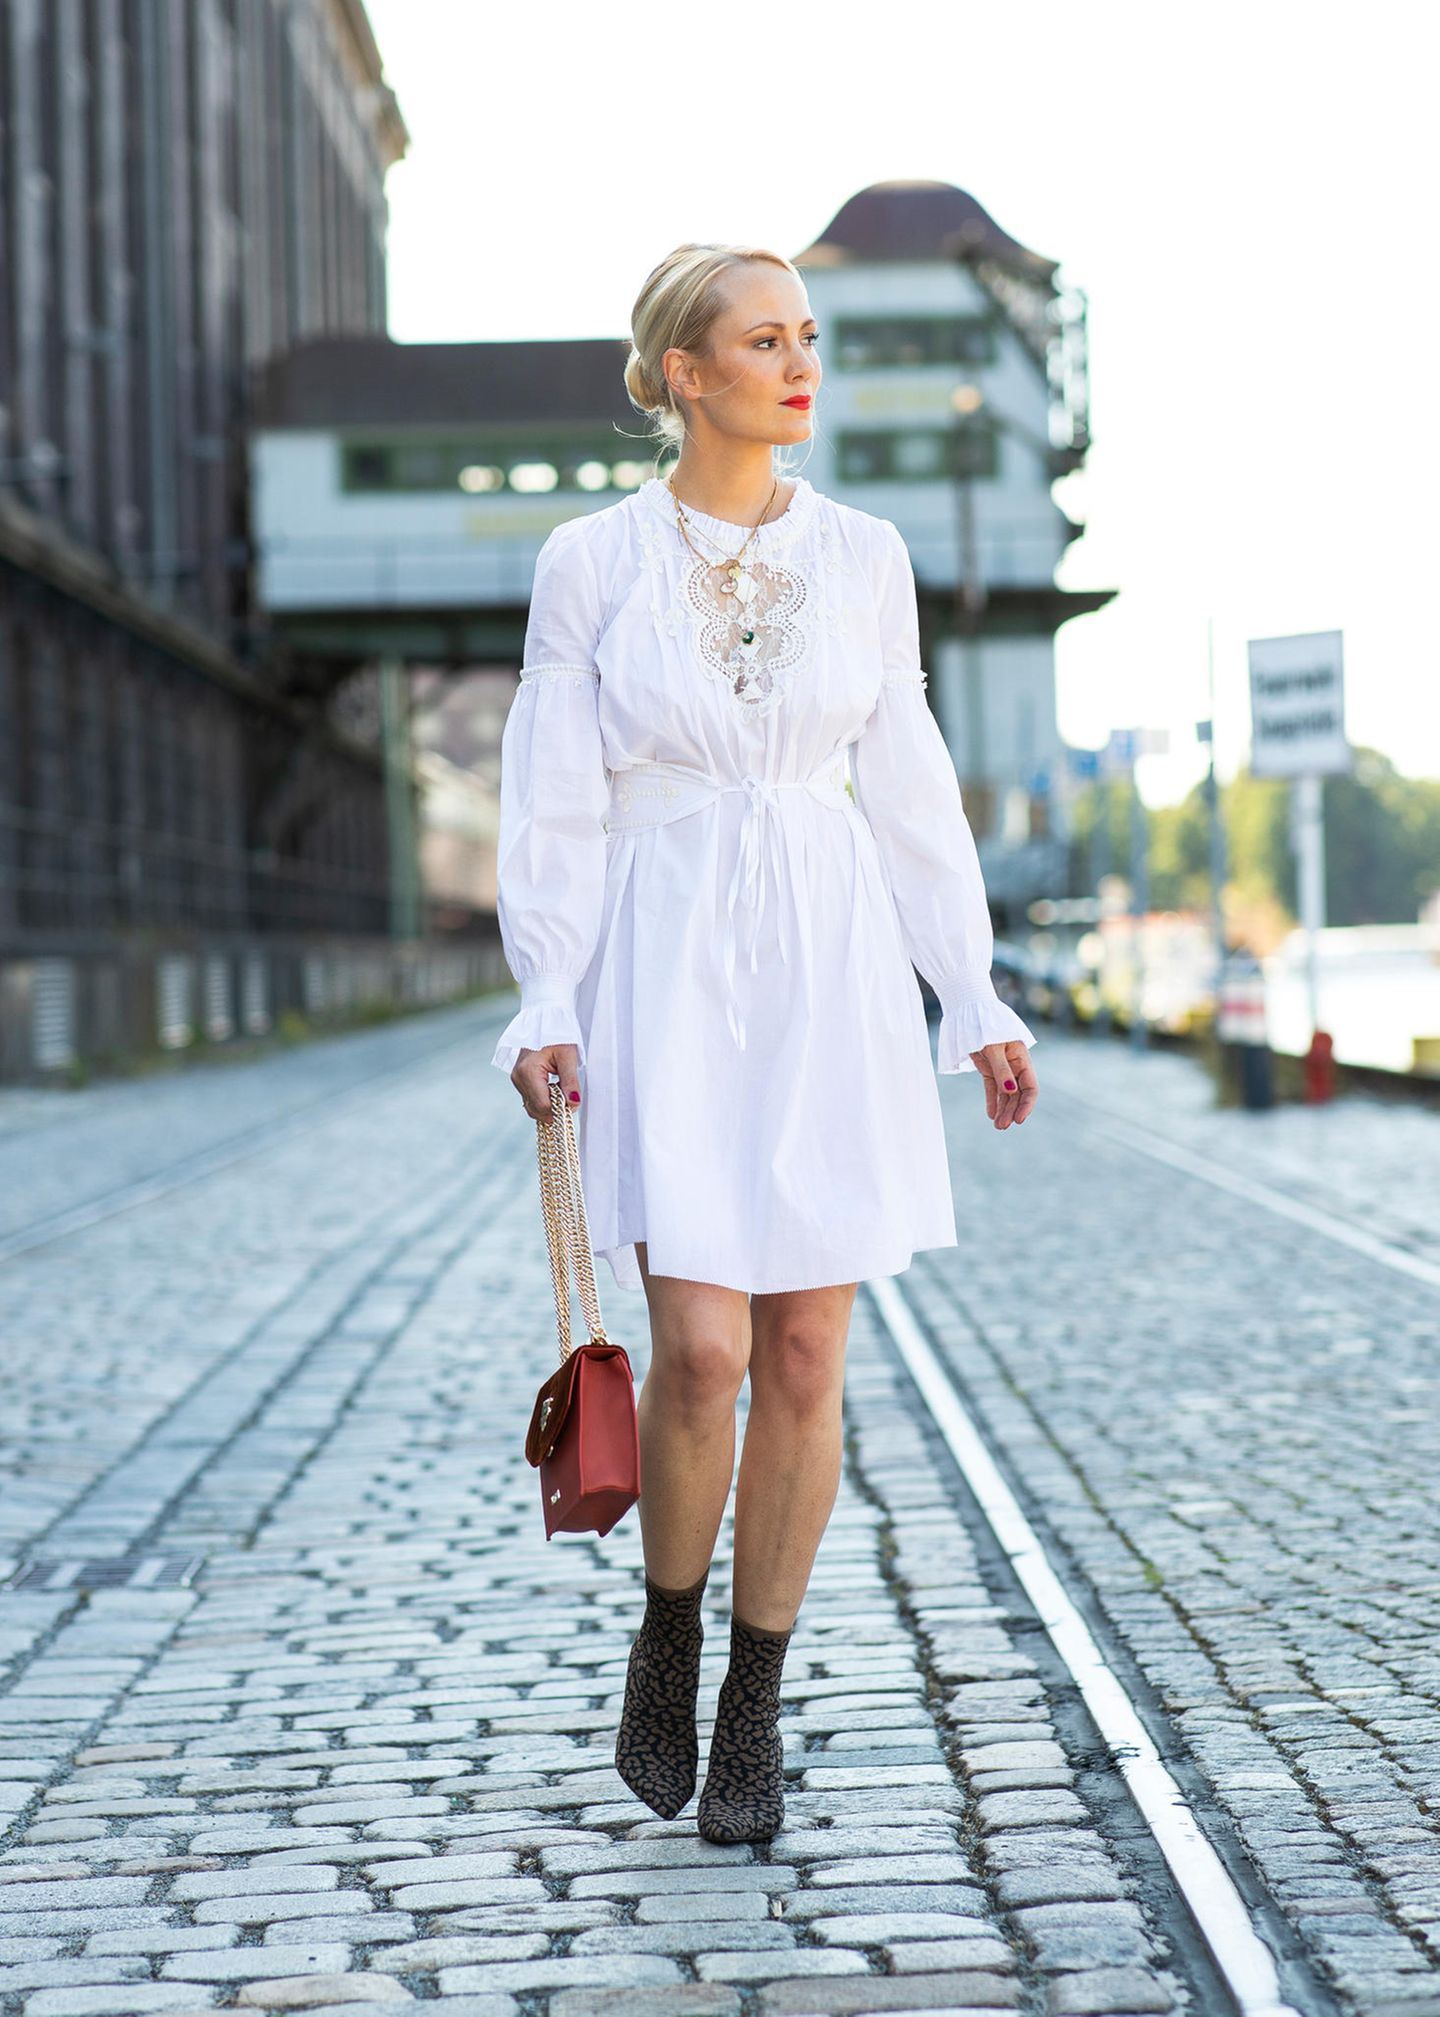 Streetstyles der Berliner Fashion Week: Kathrin Gelinsky